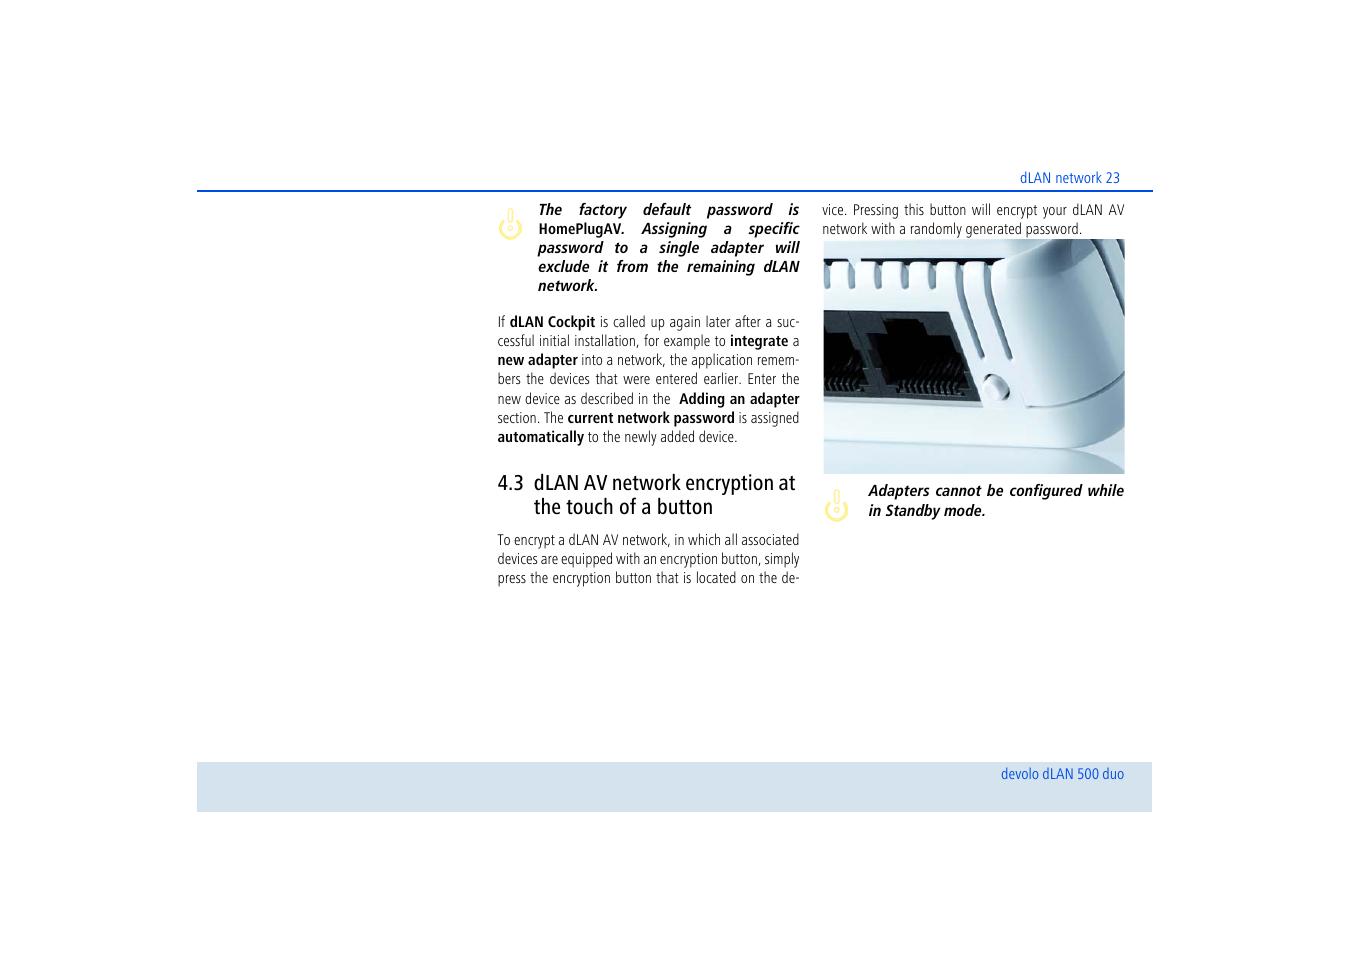 Dlan 500 duo manual devolo espanol av wireless reset – whatisbe. Com.